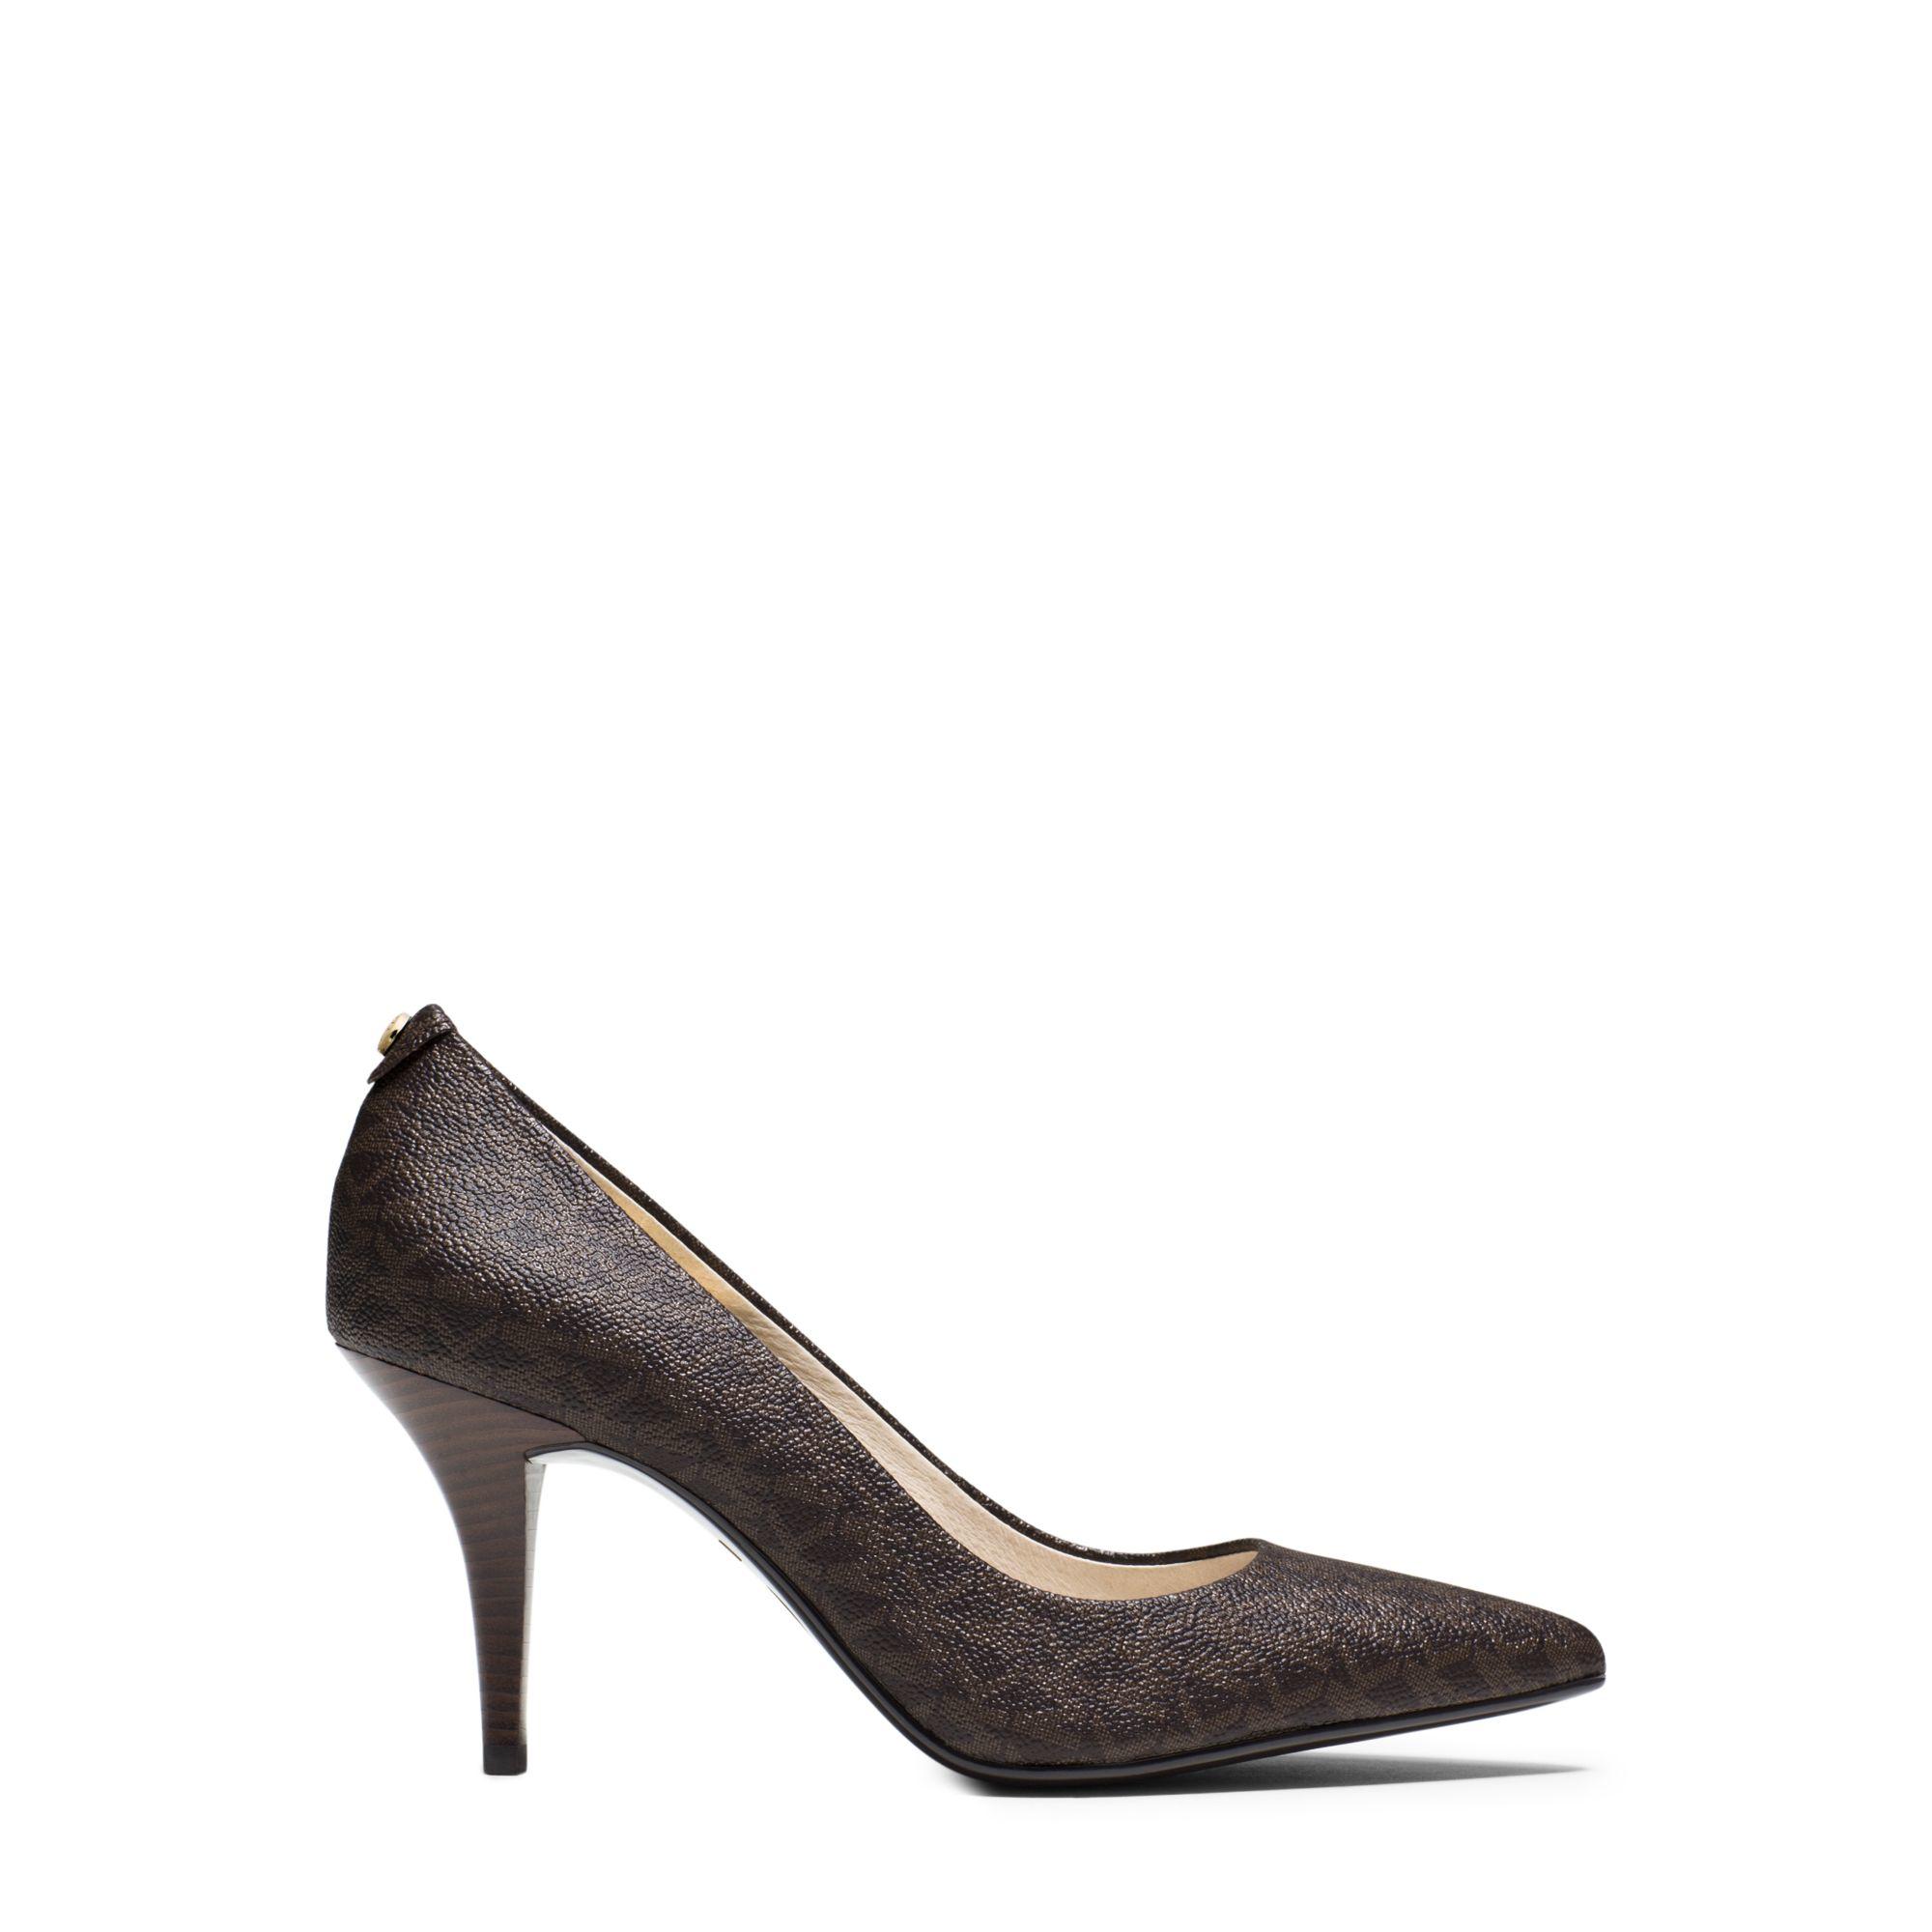 3d26a943706f Lyst - Michael Kors Flex Logo Mid-heel Pump in Brown